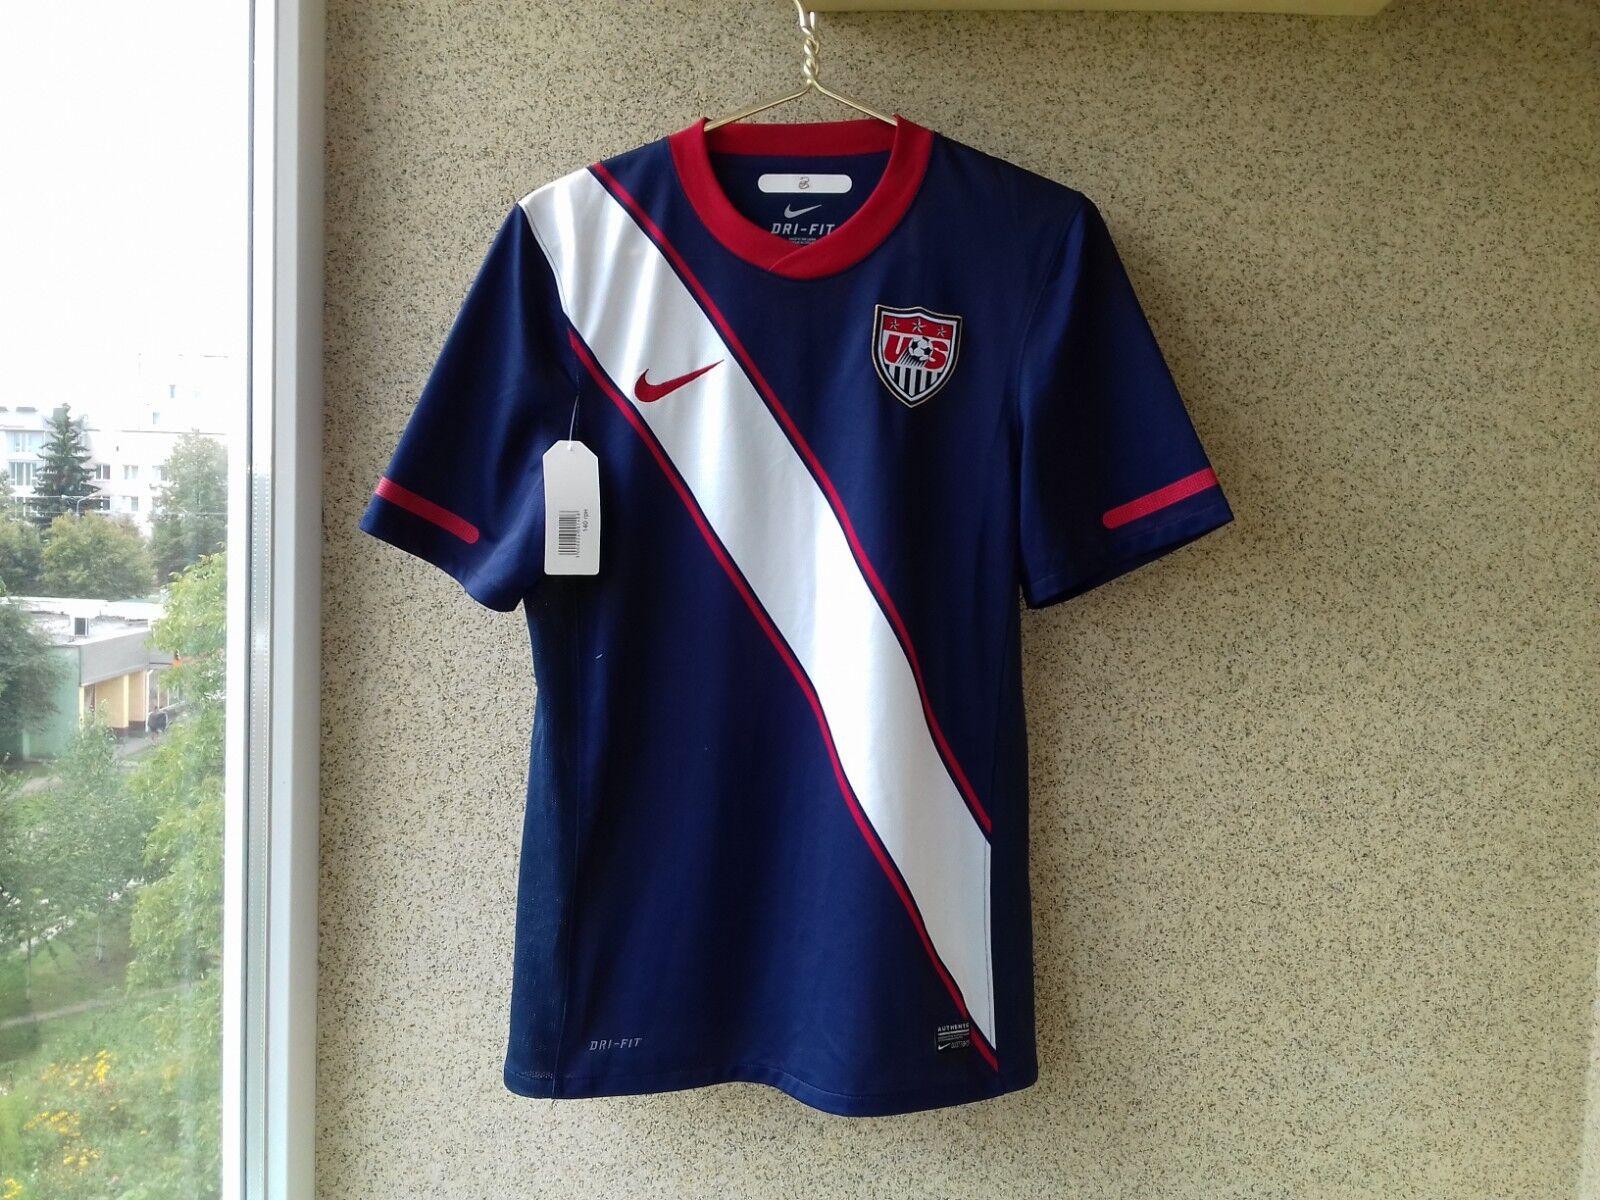 USA  Away football shirt 2010 2012 Jersey NIke Soccer Camiseta United States